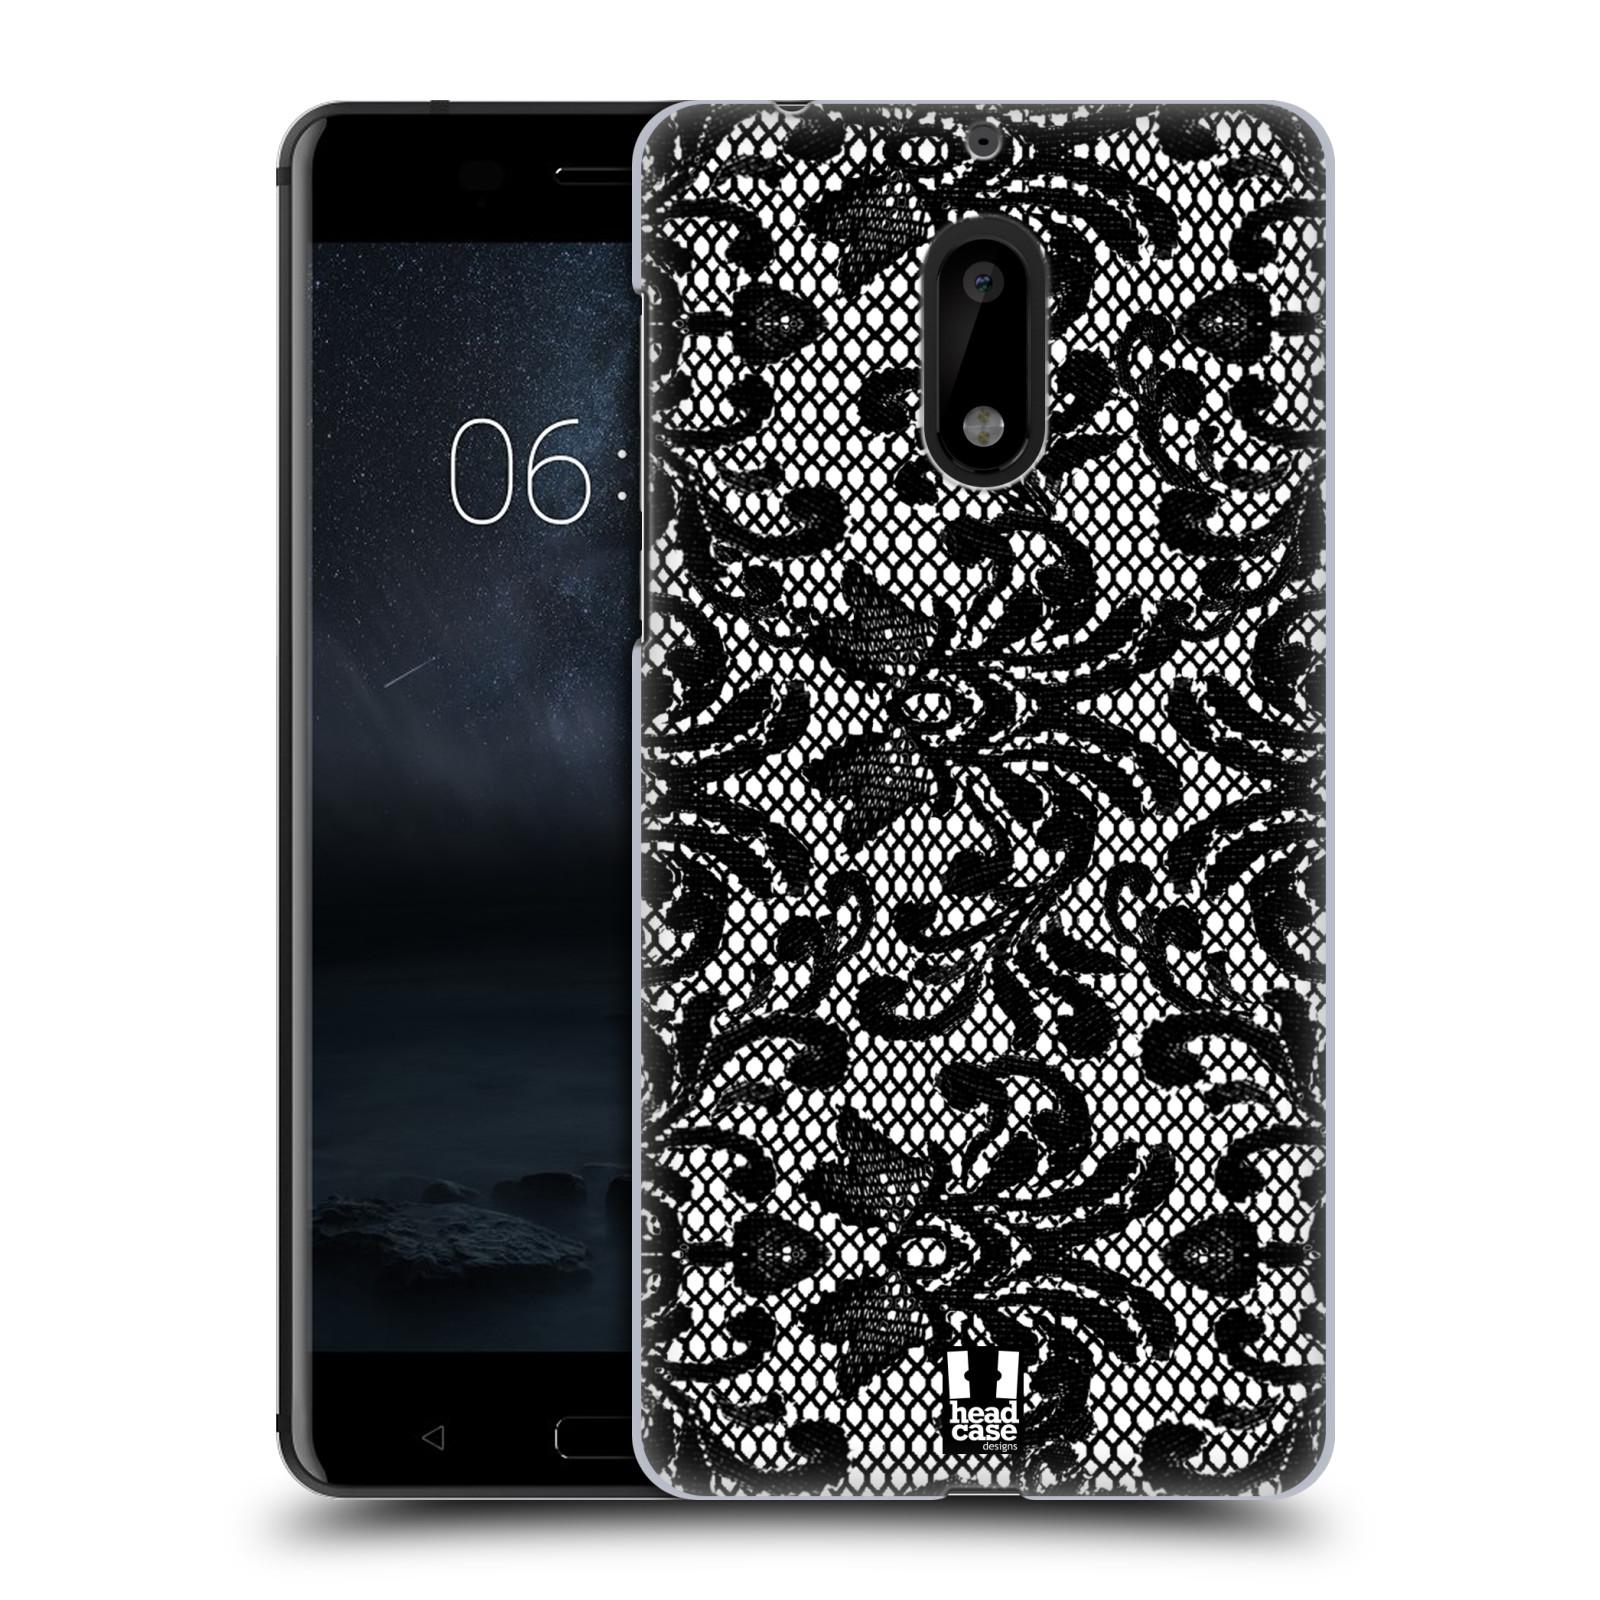 Plastové pouzdro na mobil Nokia 6 - Head Case KRAJKA (Plastový kryt či obal na mobilní telefon Nokia 6 (Dual SIM))